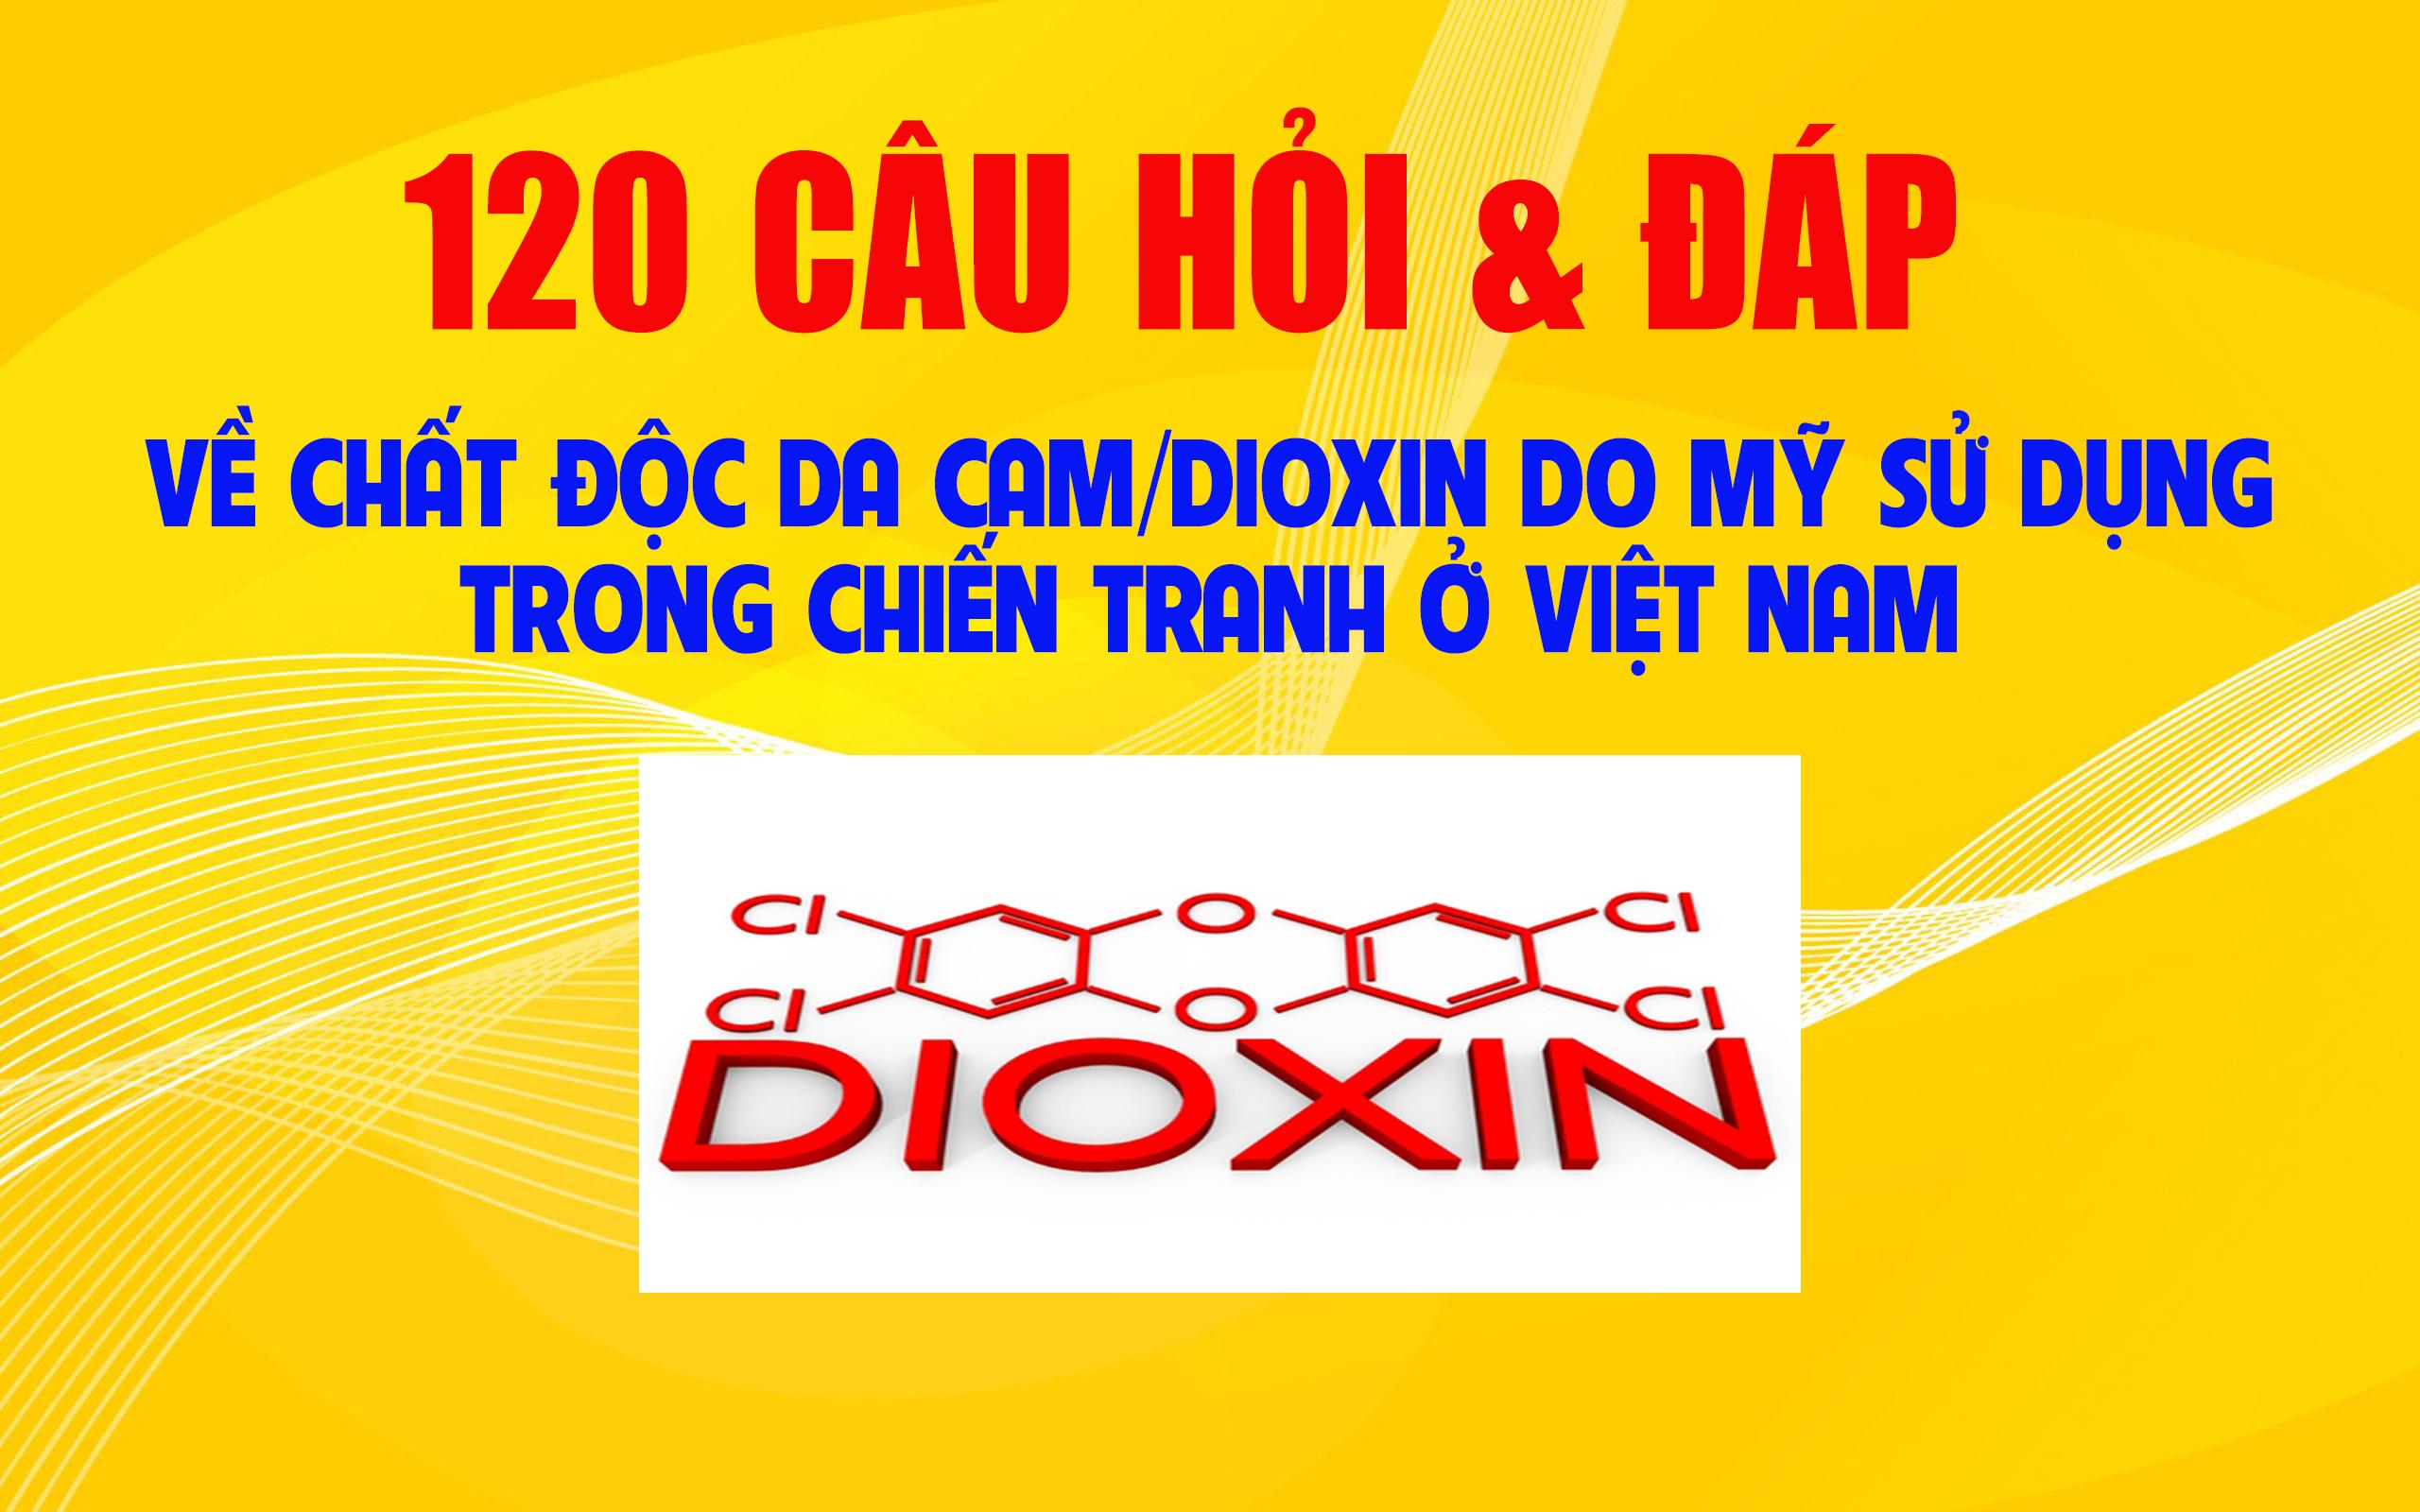 120 câu hỏi về dioxin